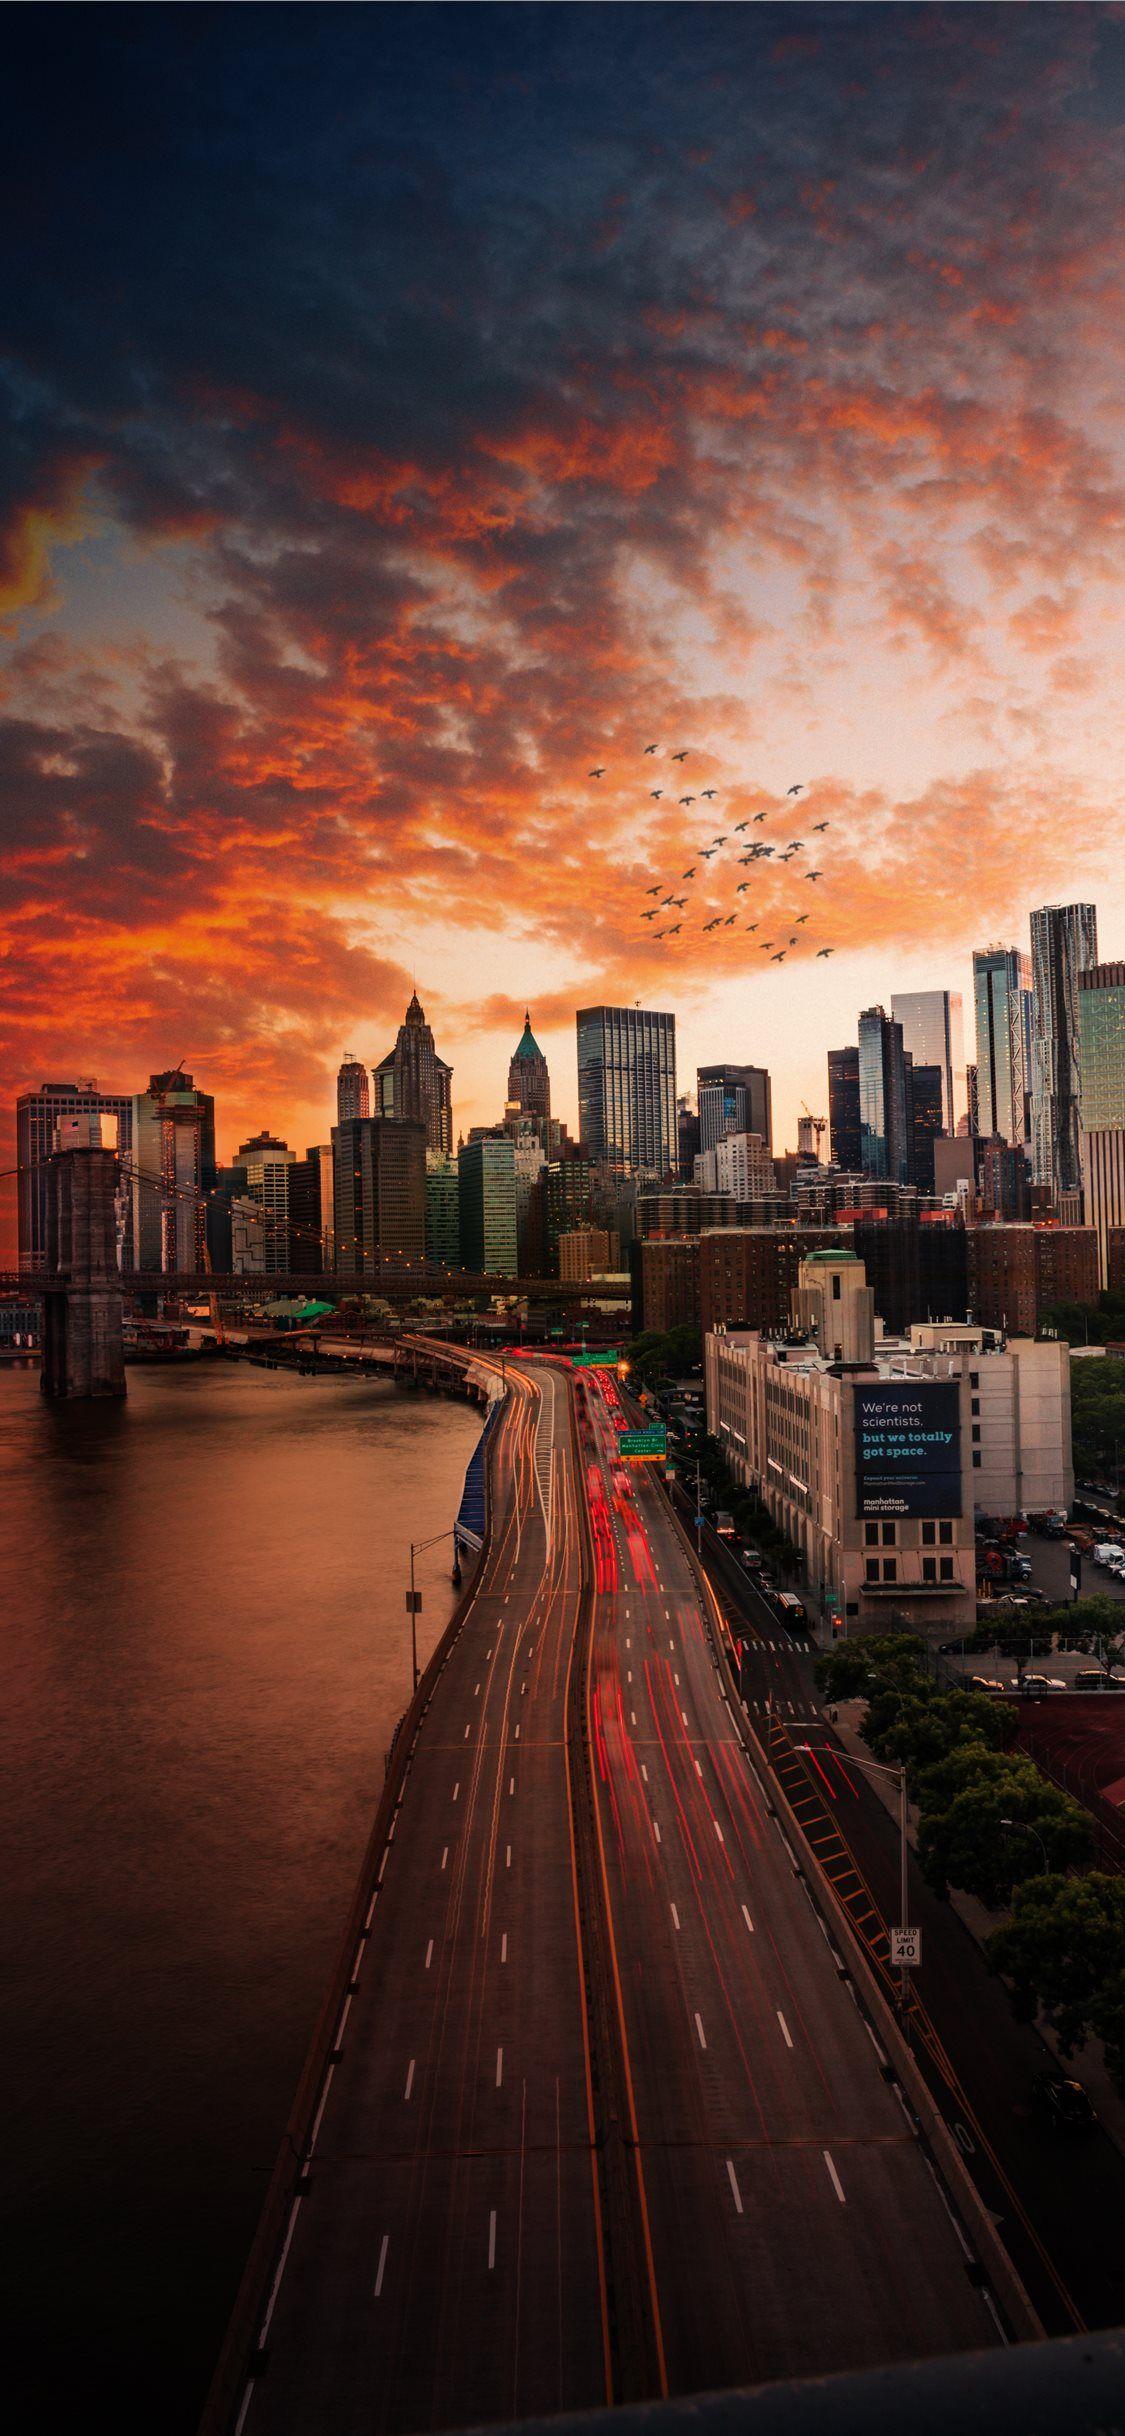 Smartphone Wallpapers City Wallpaper Hd Nature Wallpapers New York Wallpaper